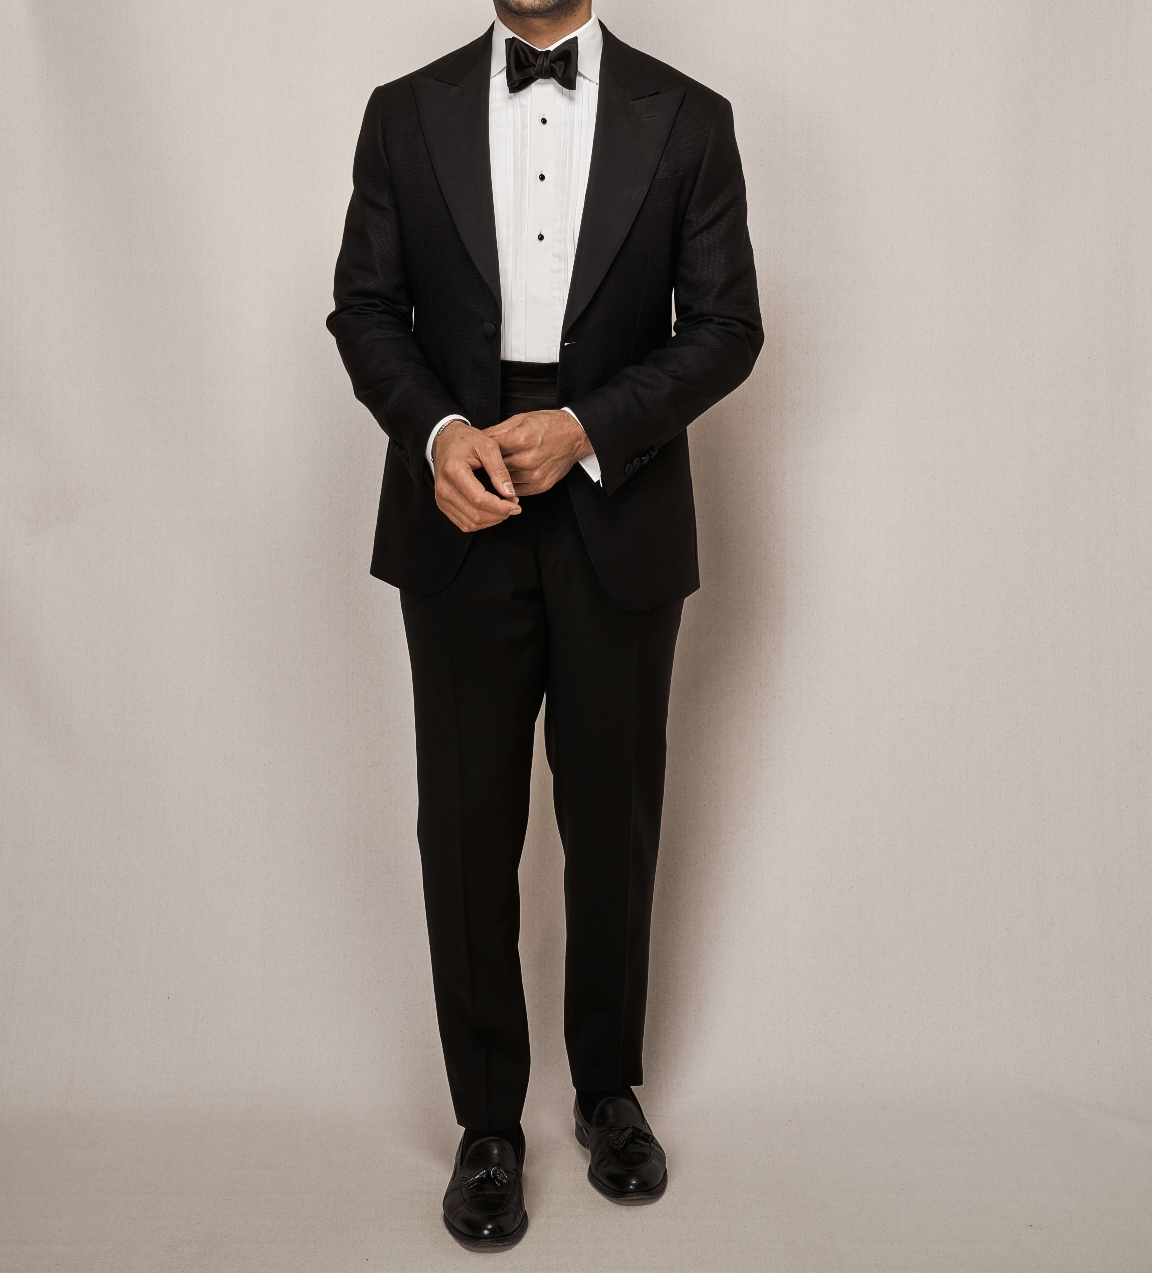 Man modelling a classic black tuxedo